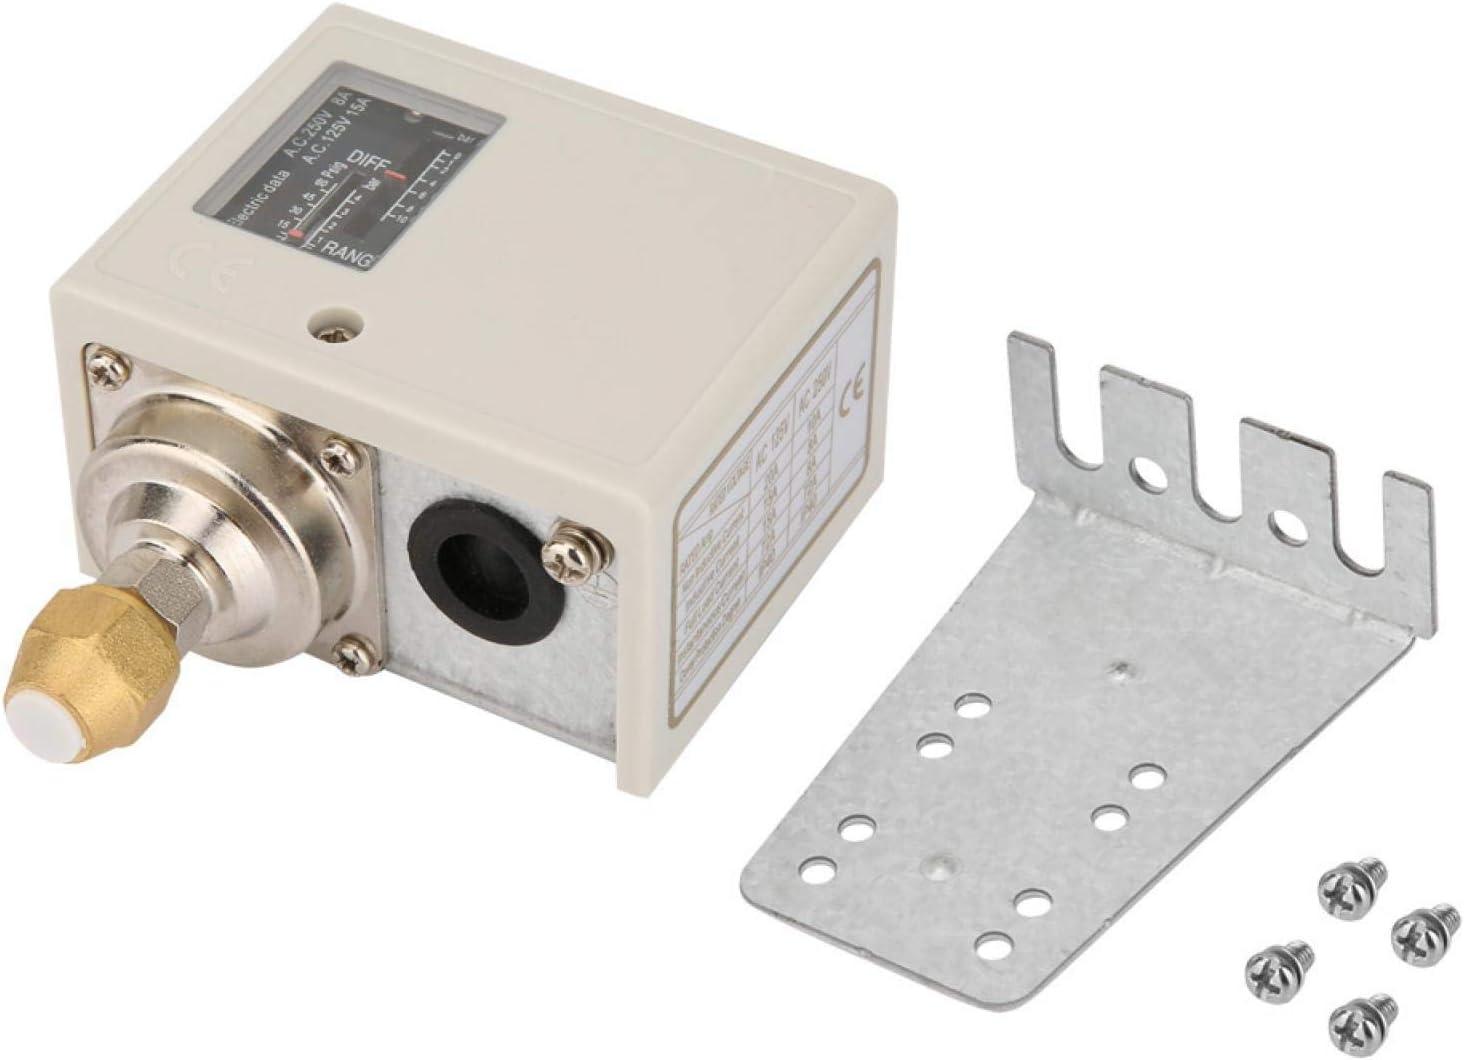 Pressure Under blast sales Switch Other Non corrosive Mounting Brac 2021 model Media Standard